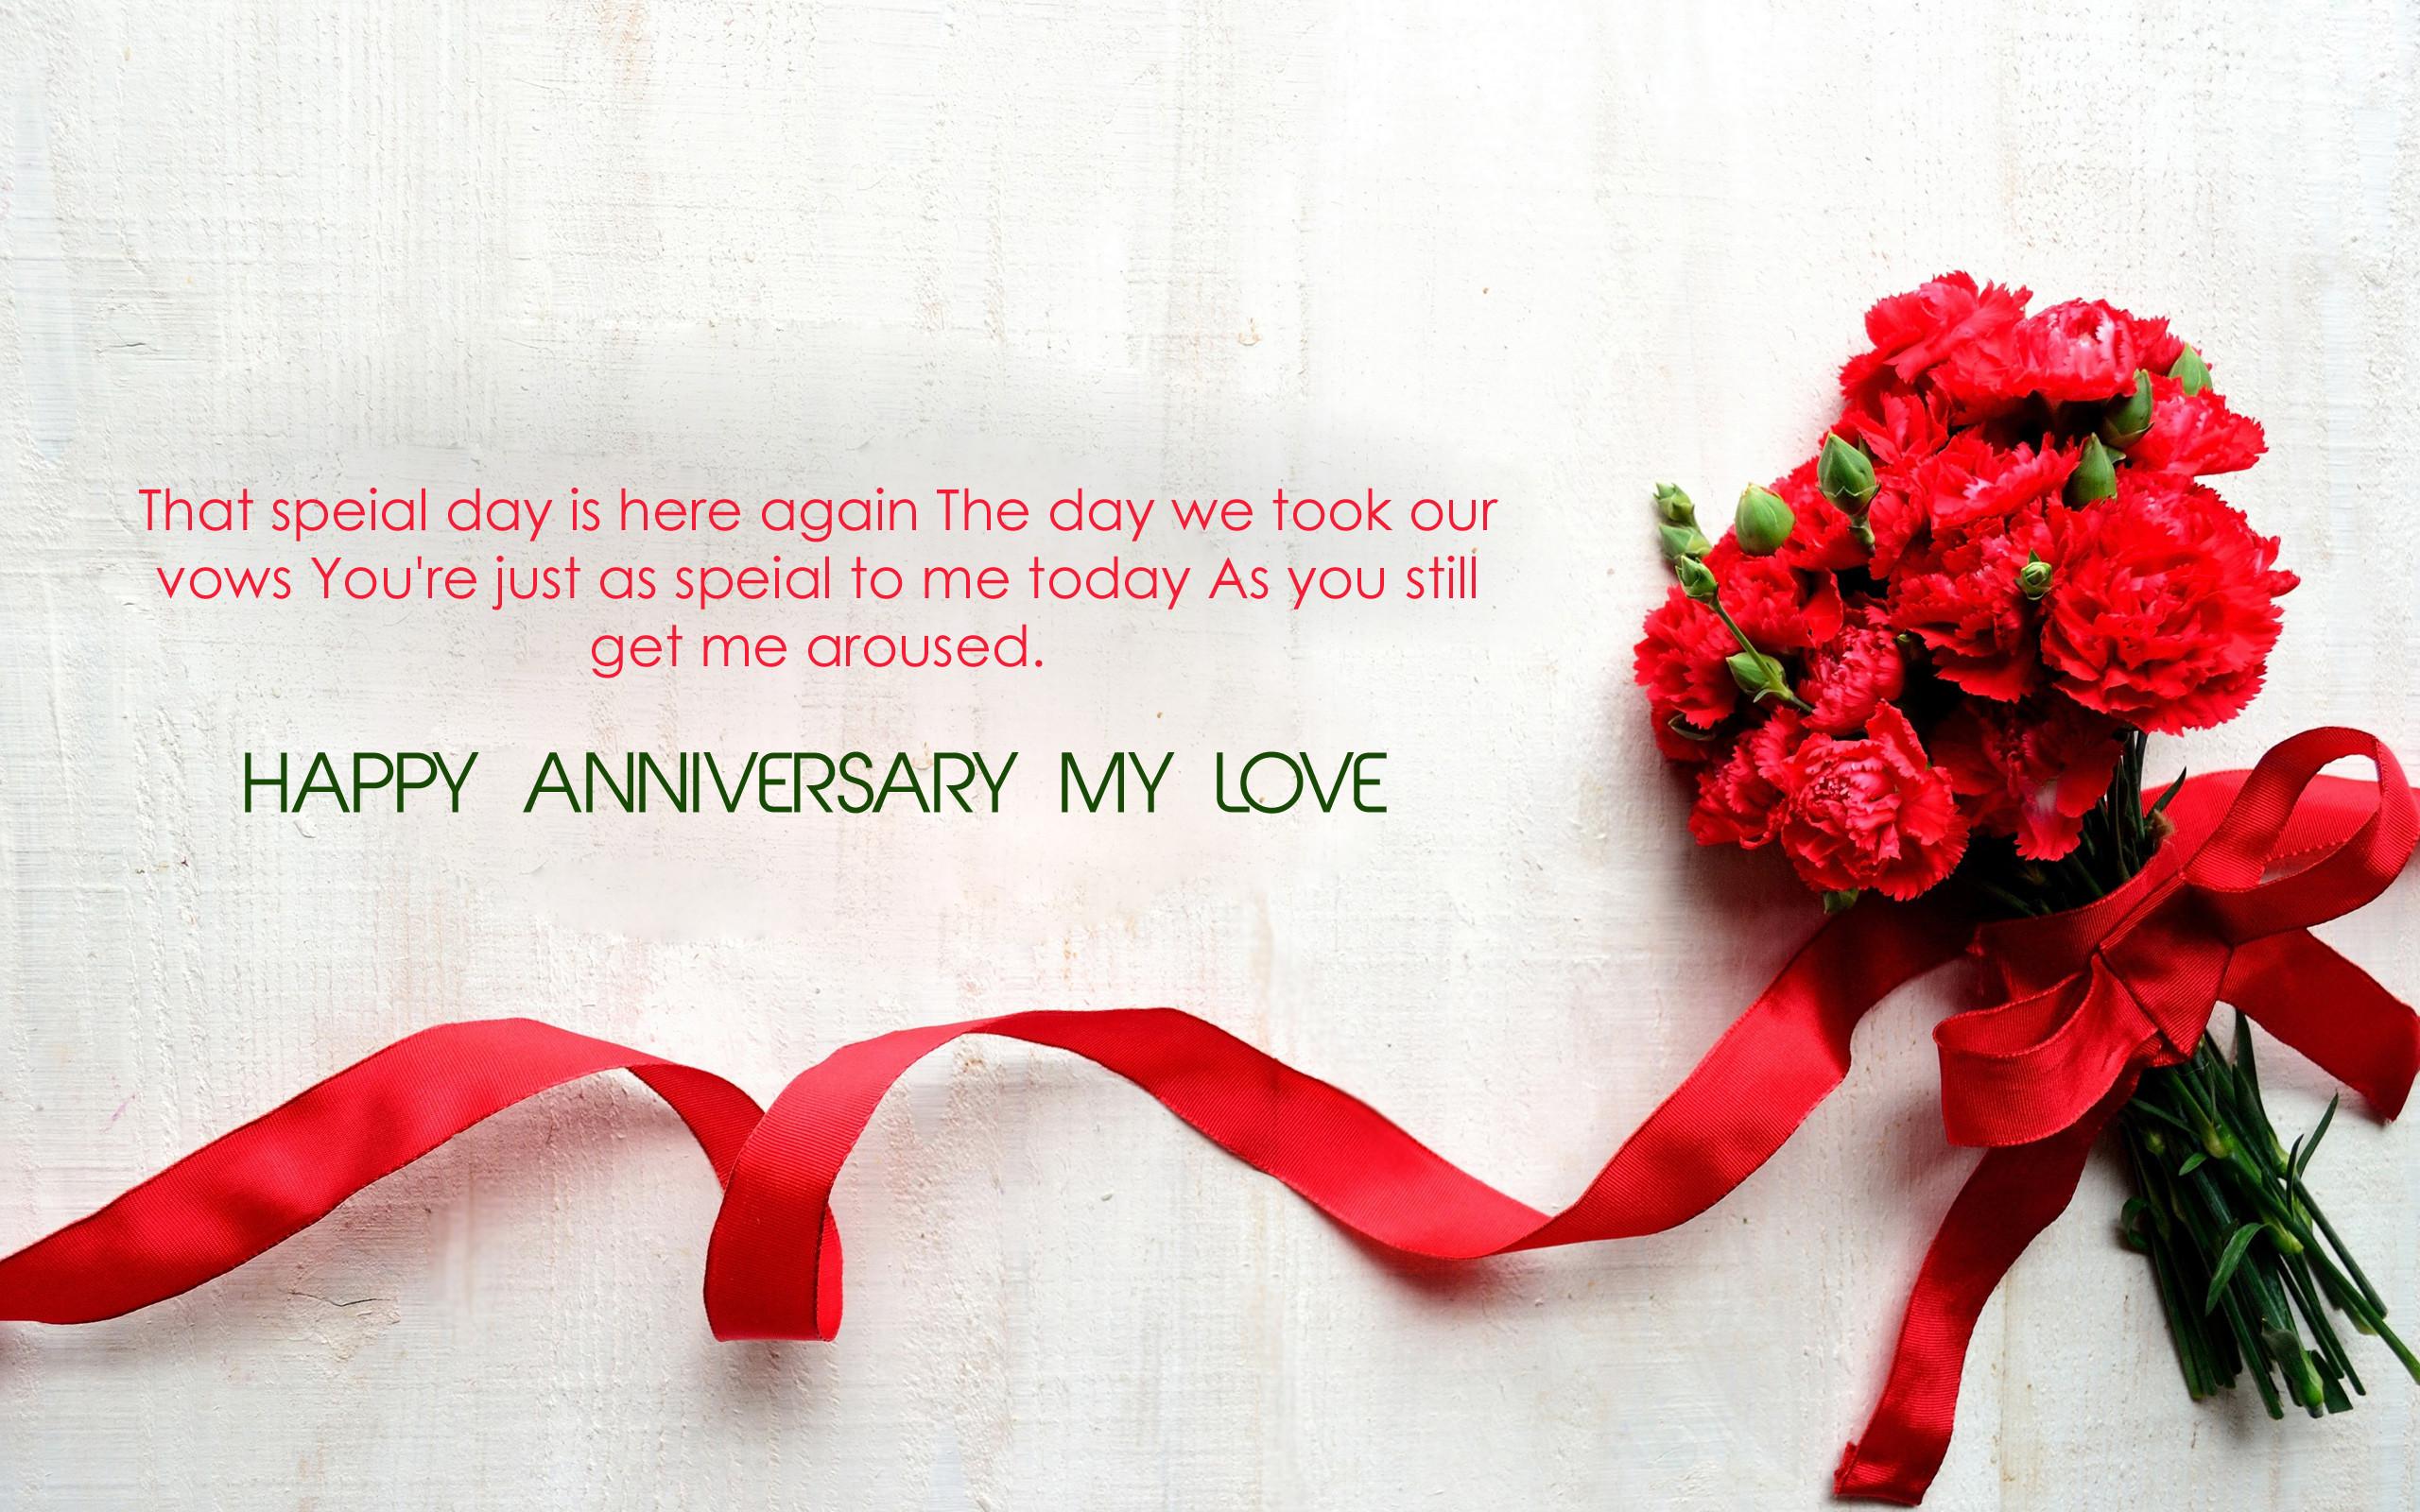 Love Message Wallpaper 60 Images